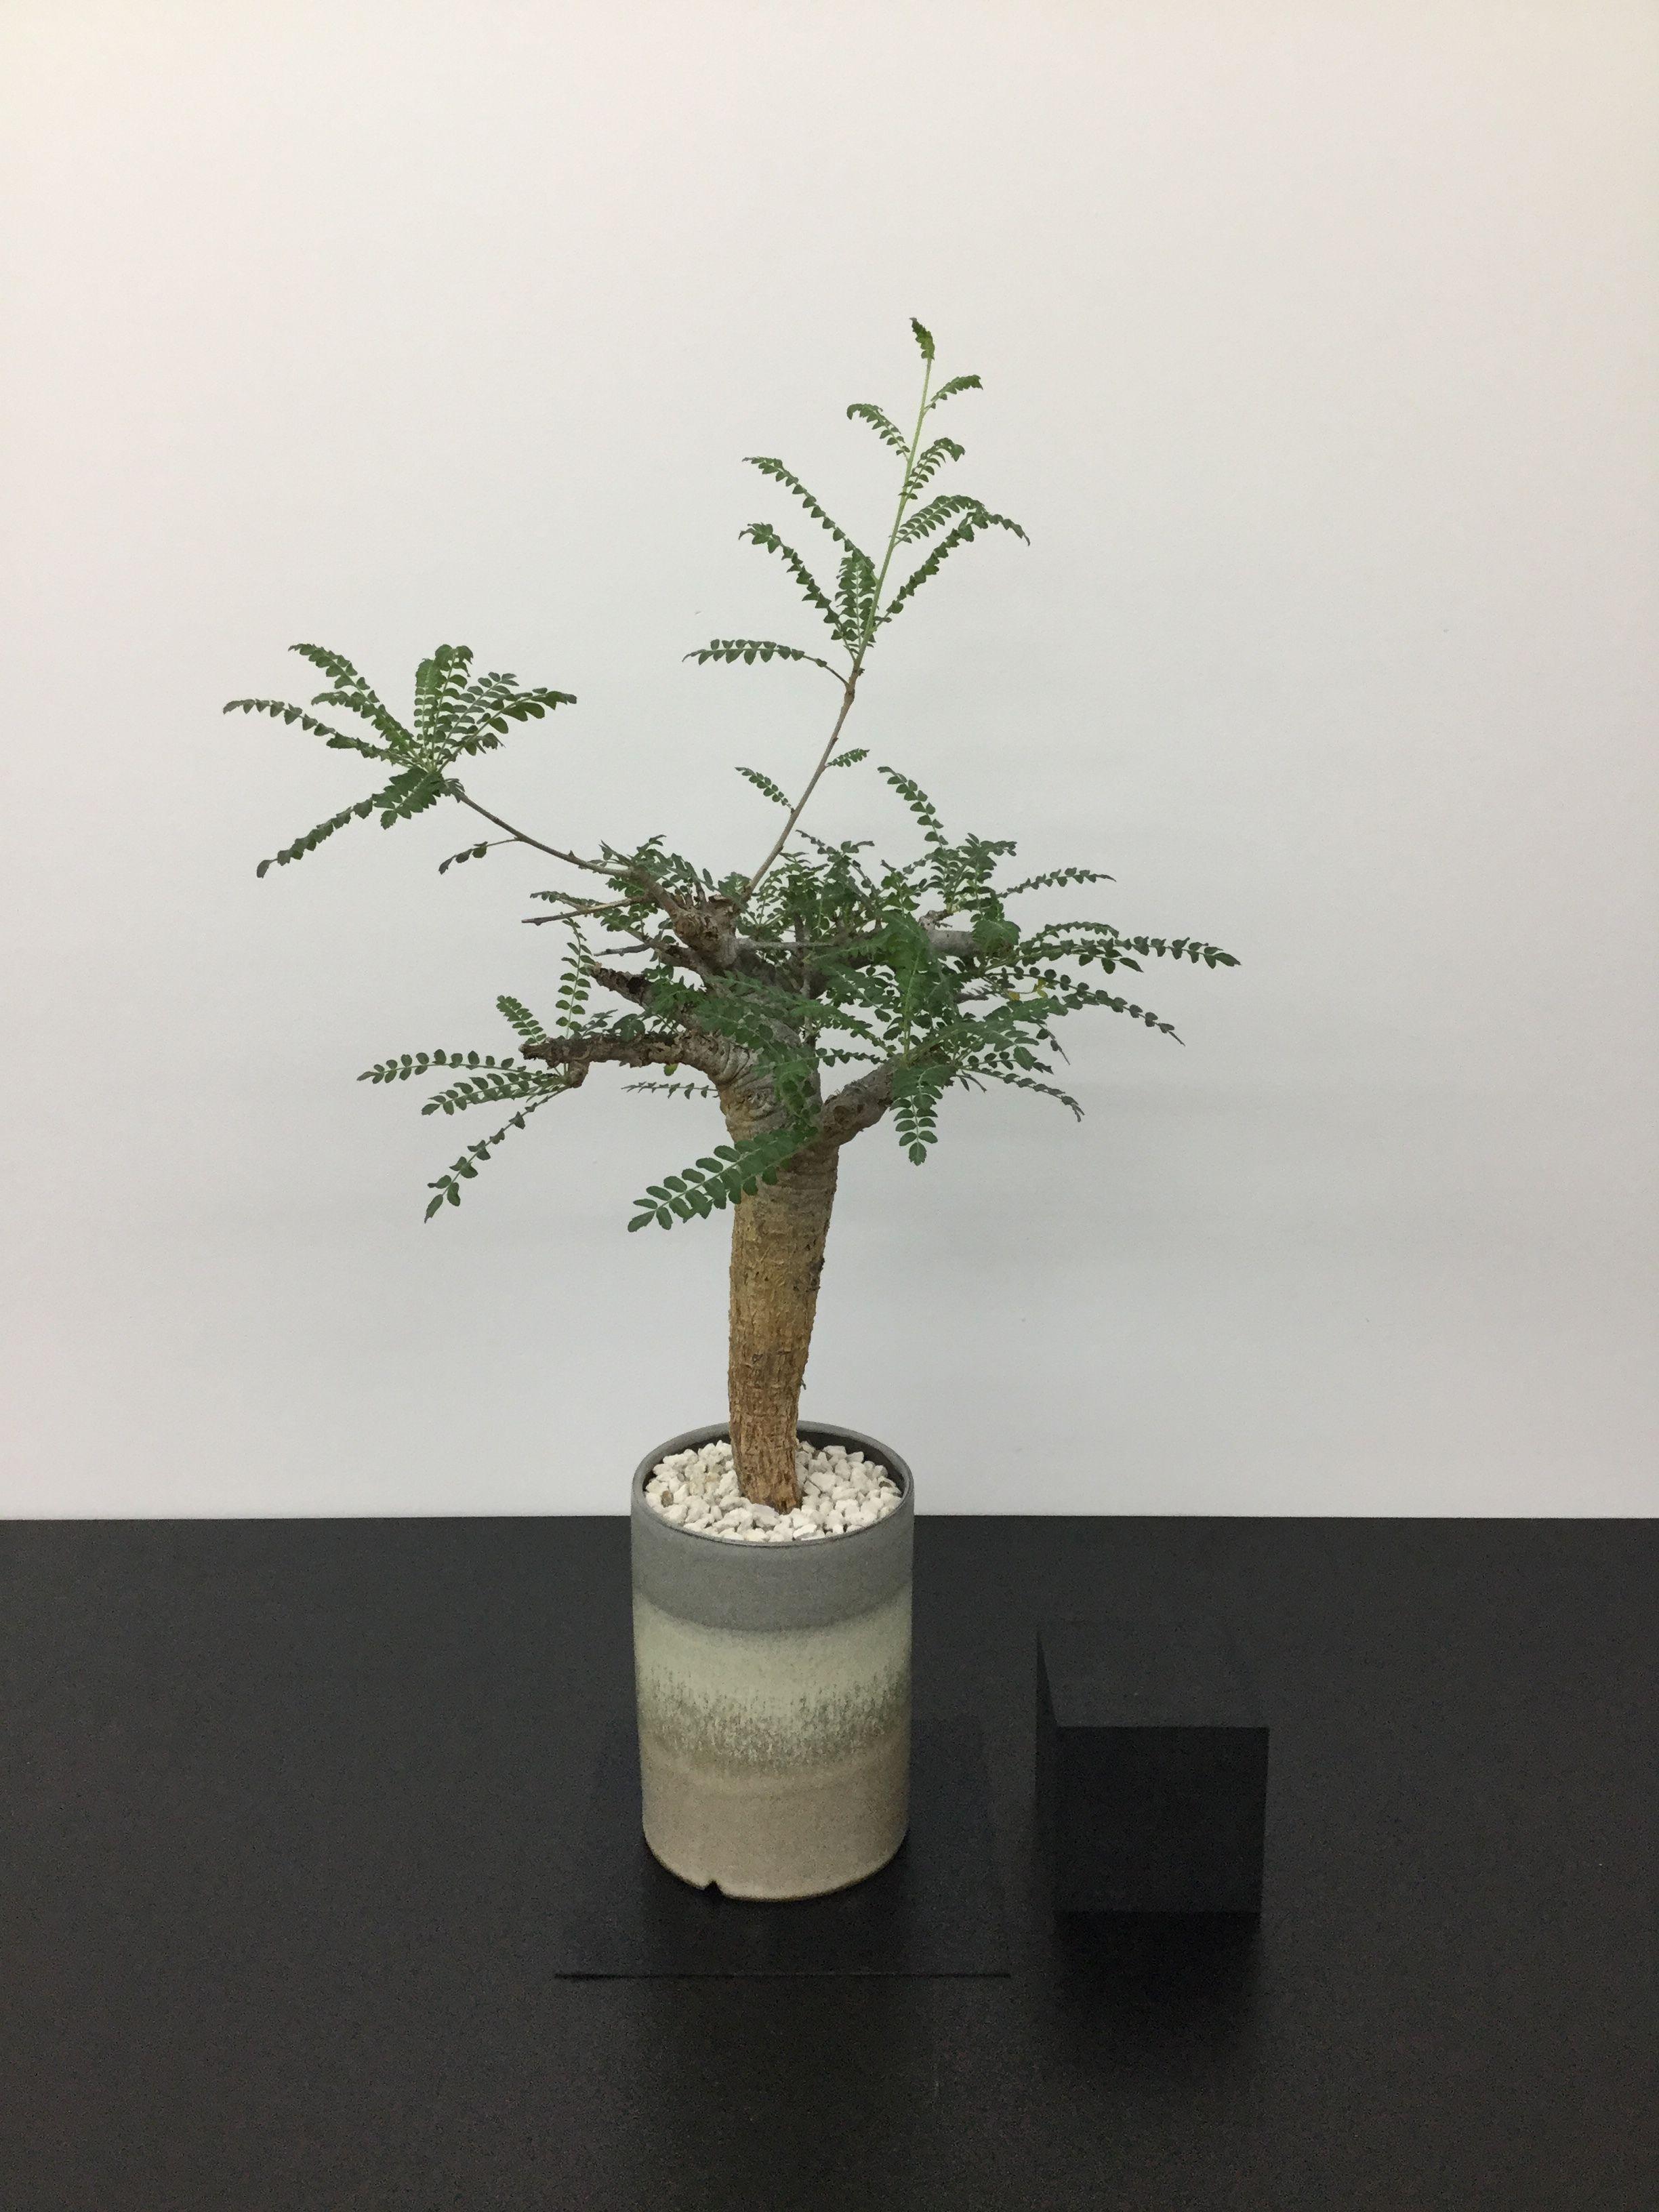 Boswellia neglecta ボスウェリア  ネグレクタ